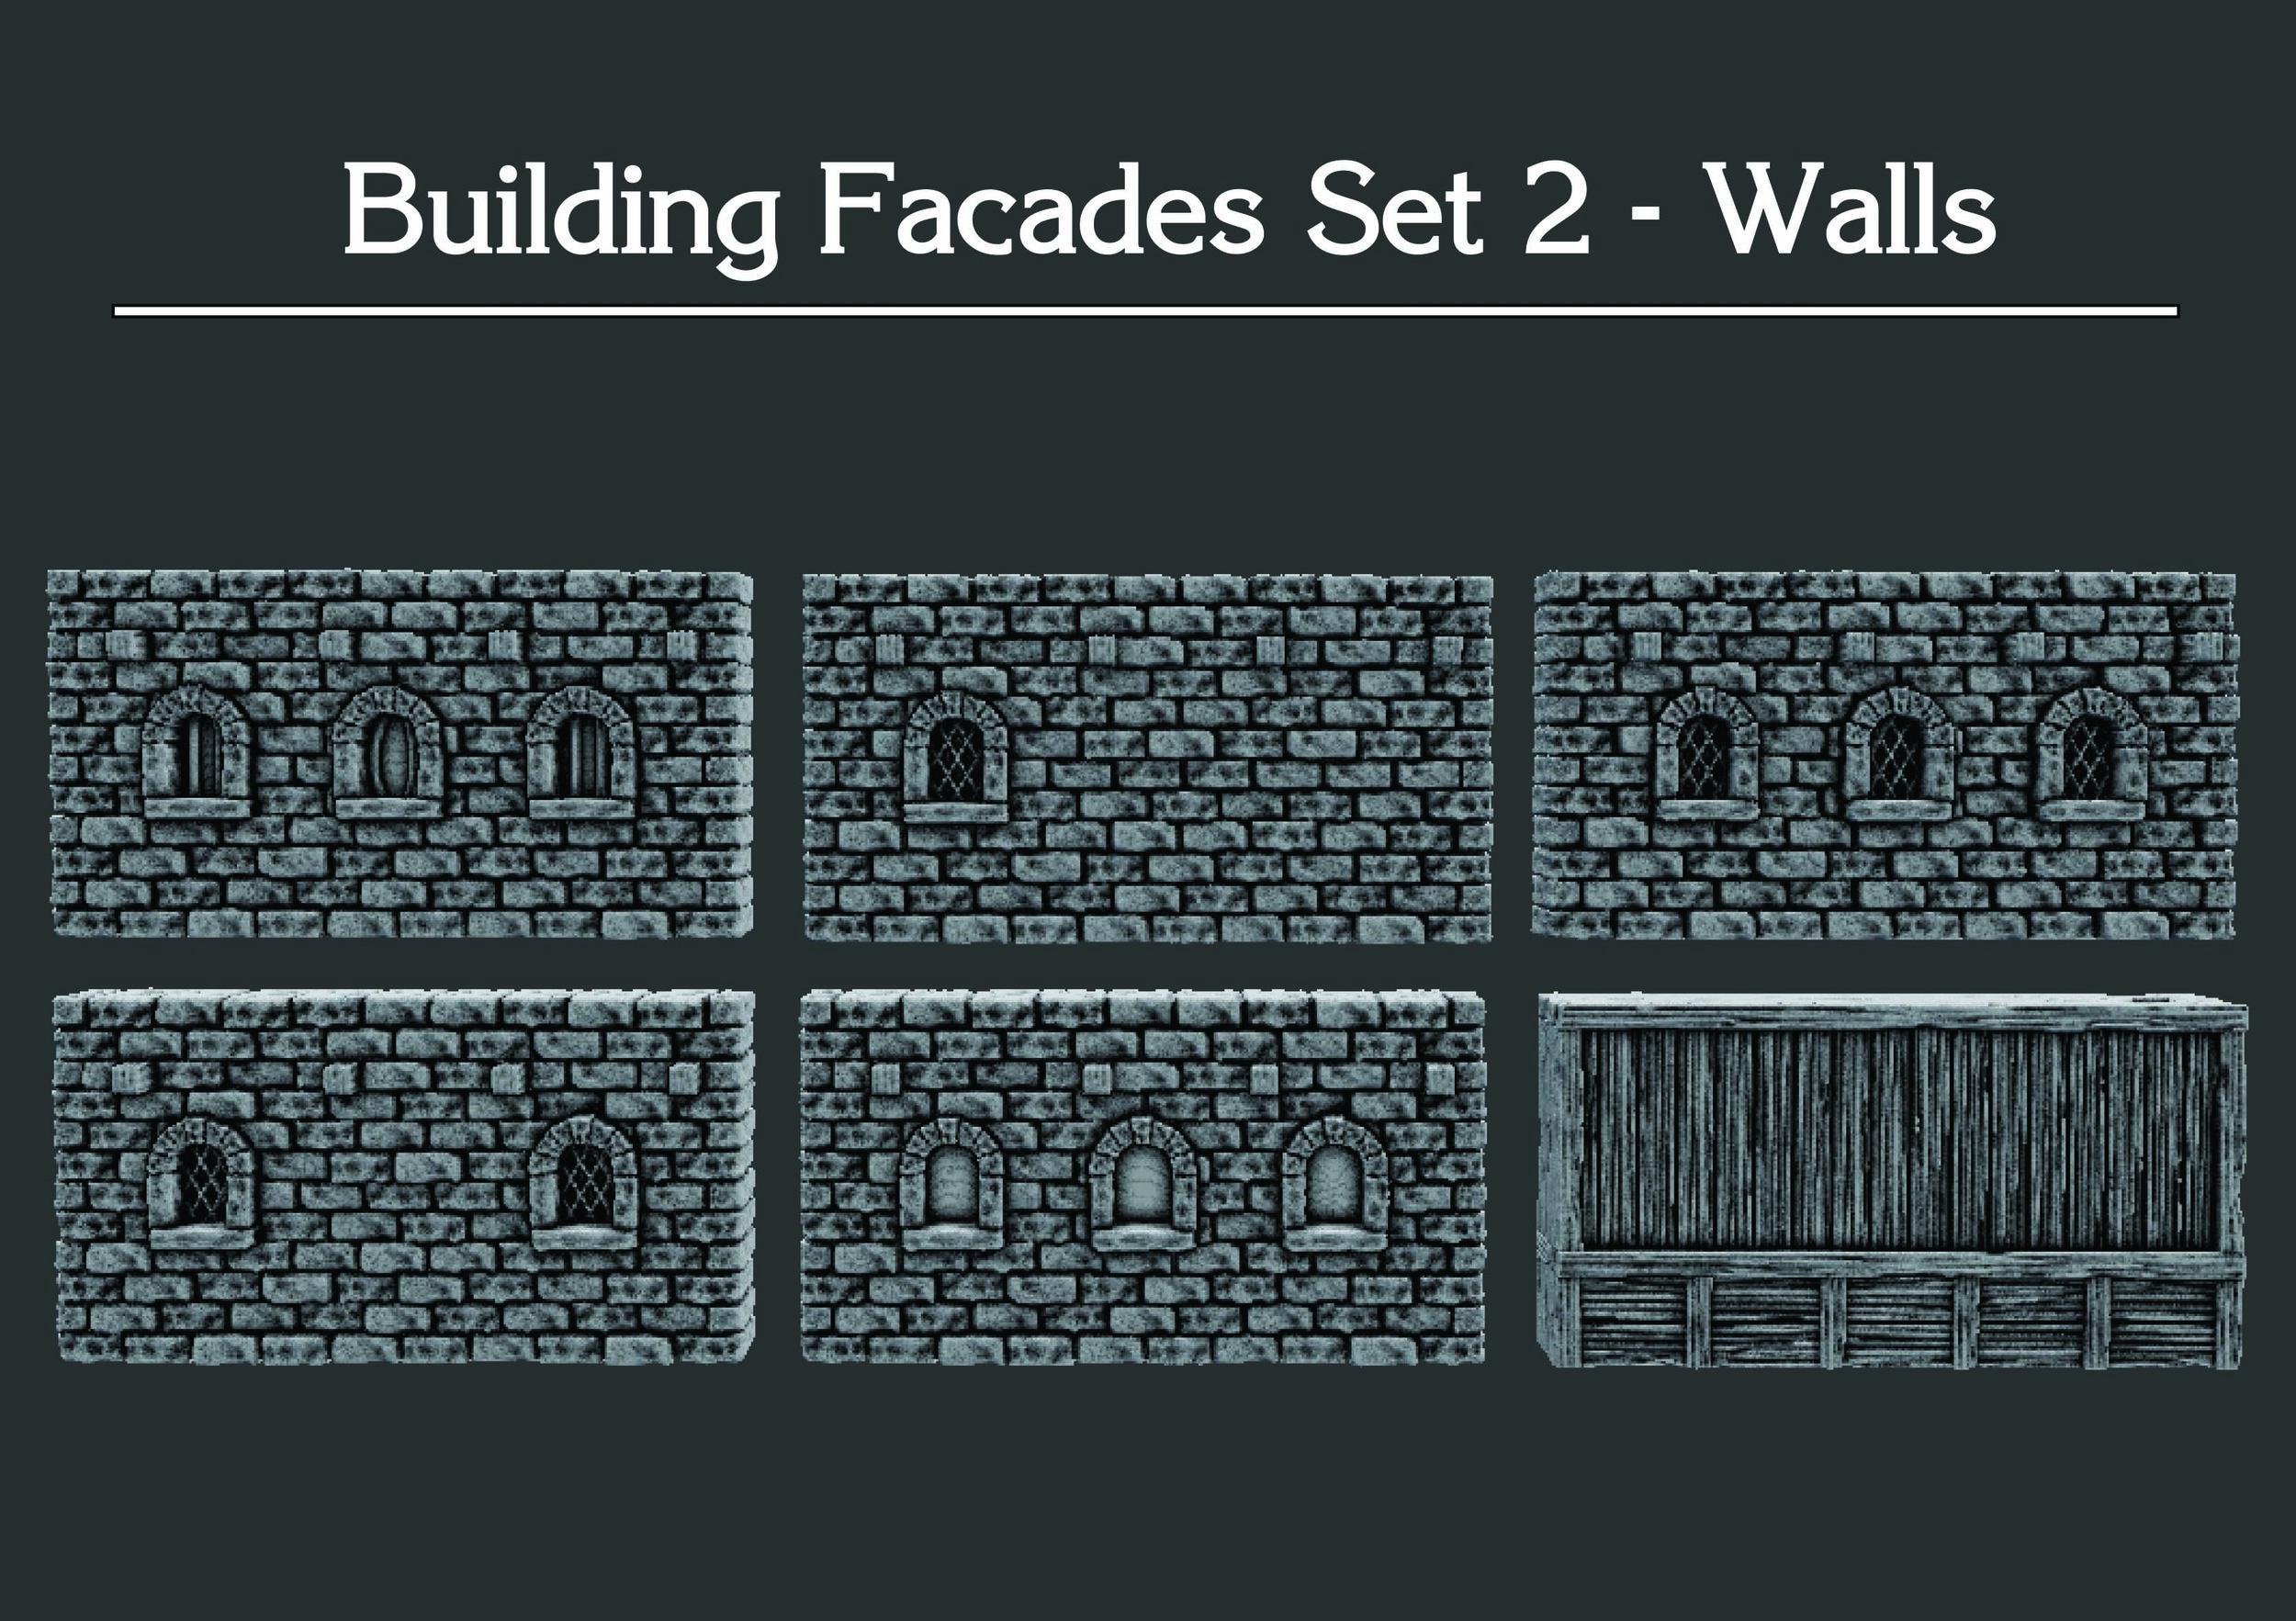 Building Facades Set 2 Walls 1.1.jpg